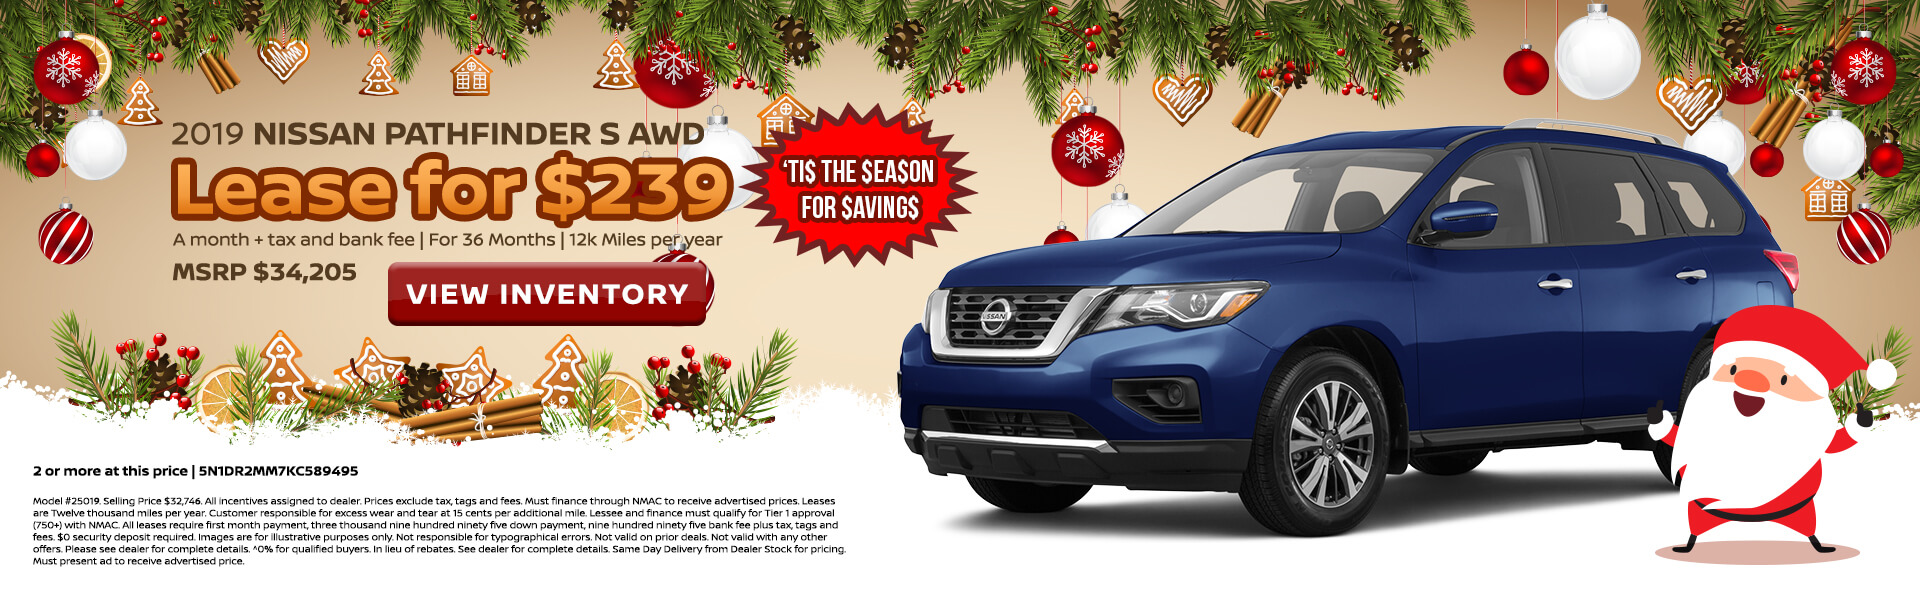 Nissan Pathfinder $239 Lease